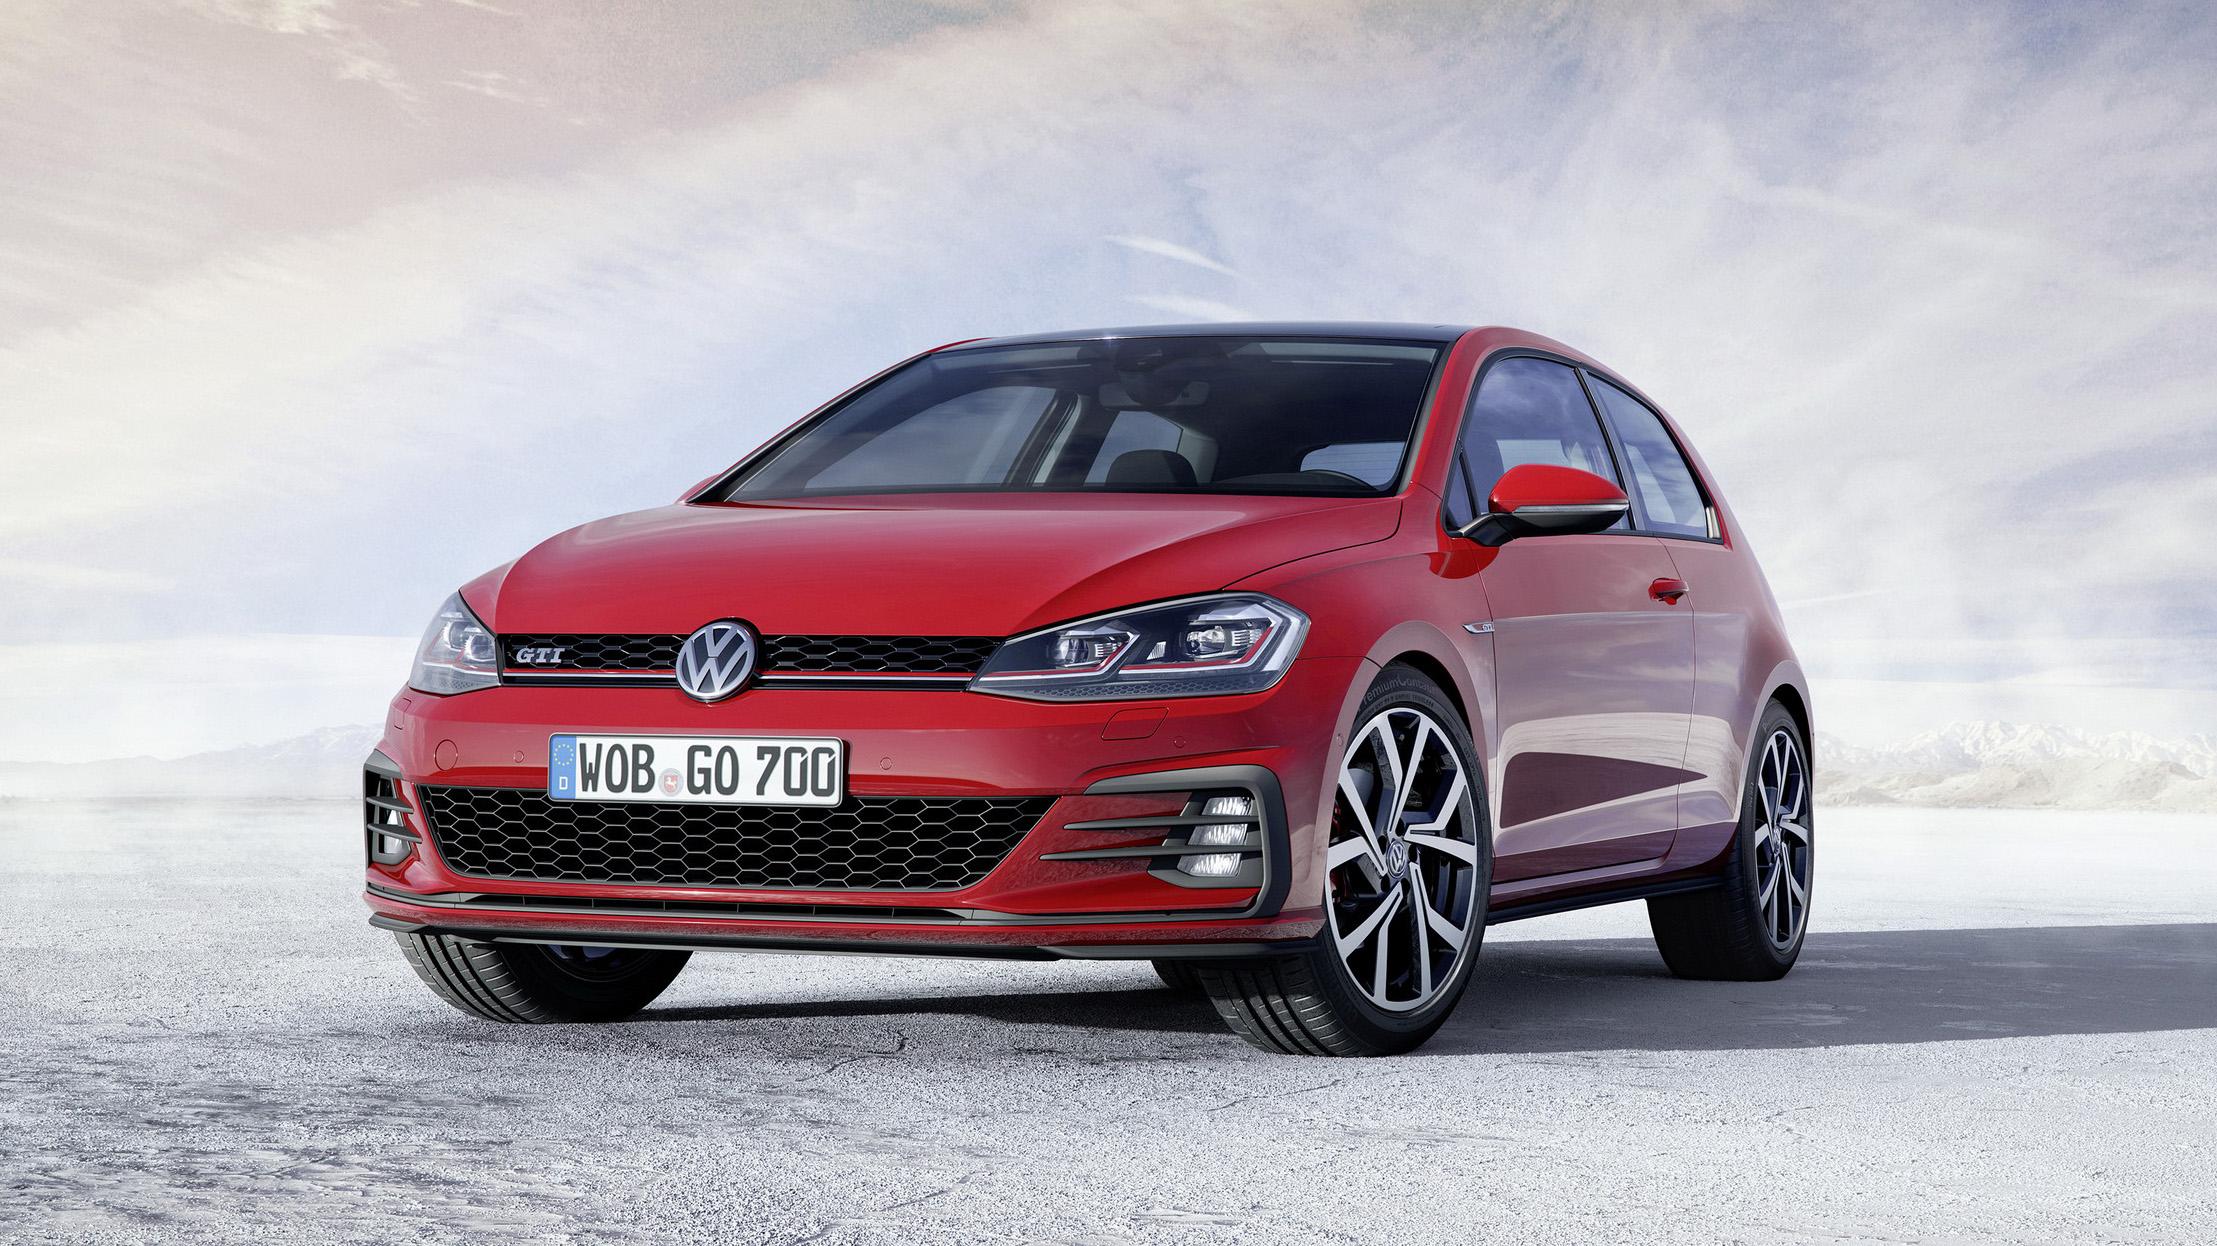 Volkswagen Golf VII Restyling 2017 - now Station wagon 5 door #3